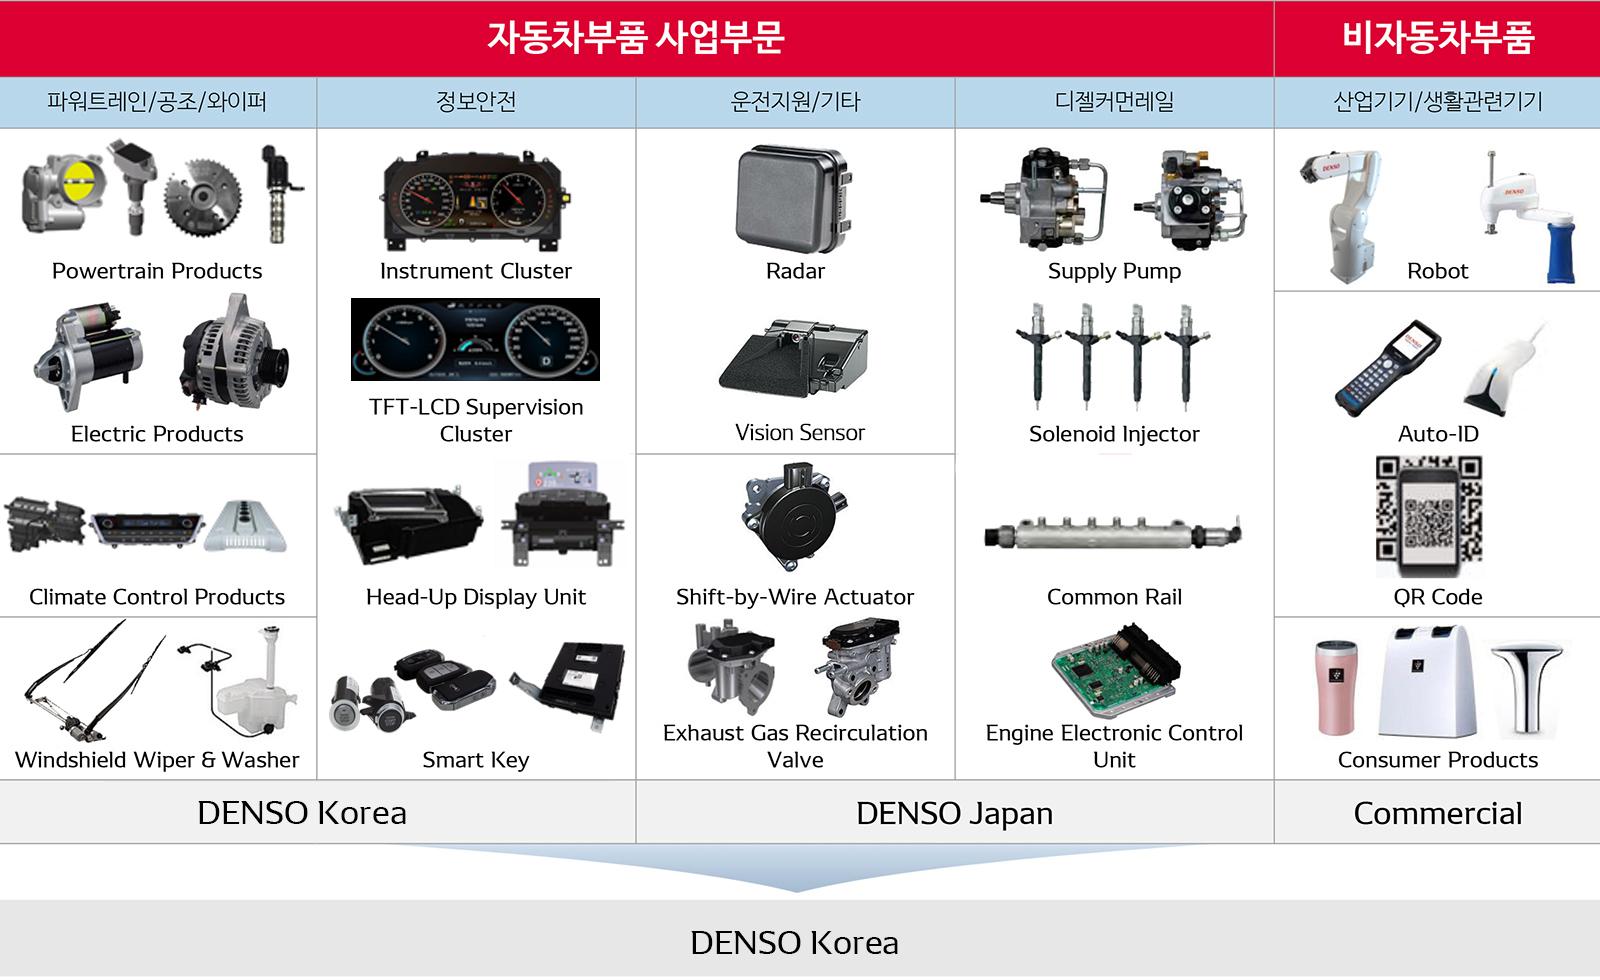 densokorea-img-overview